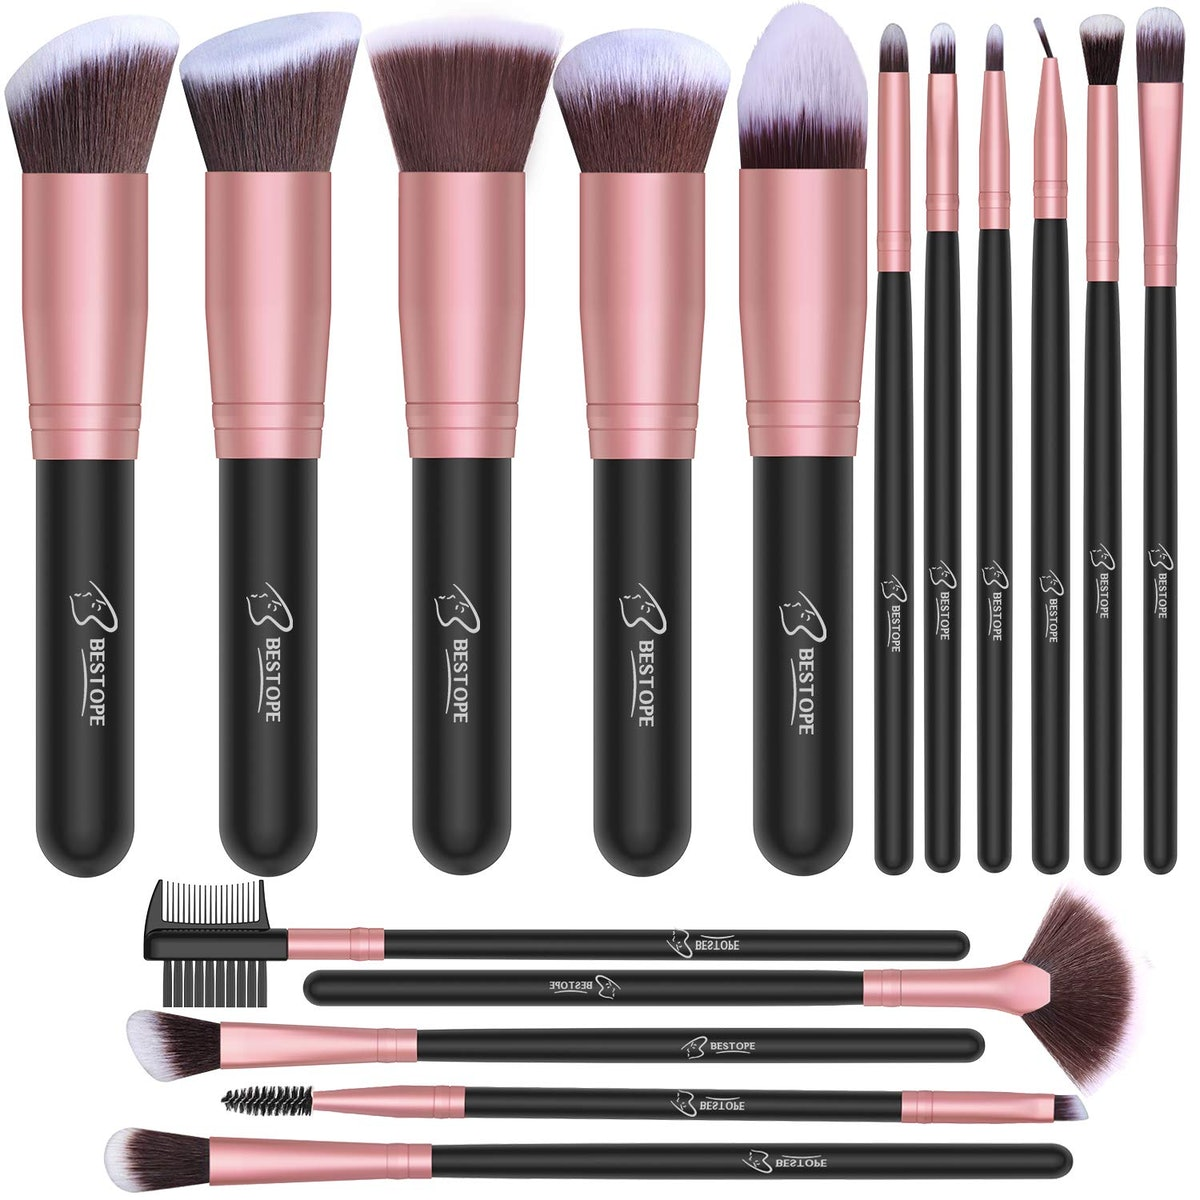 BESTOPE Makeup Brushes (16-Piece Set)